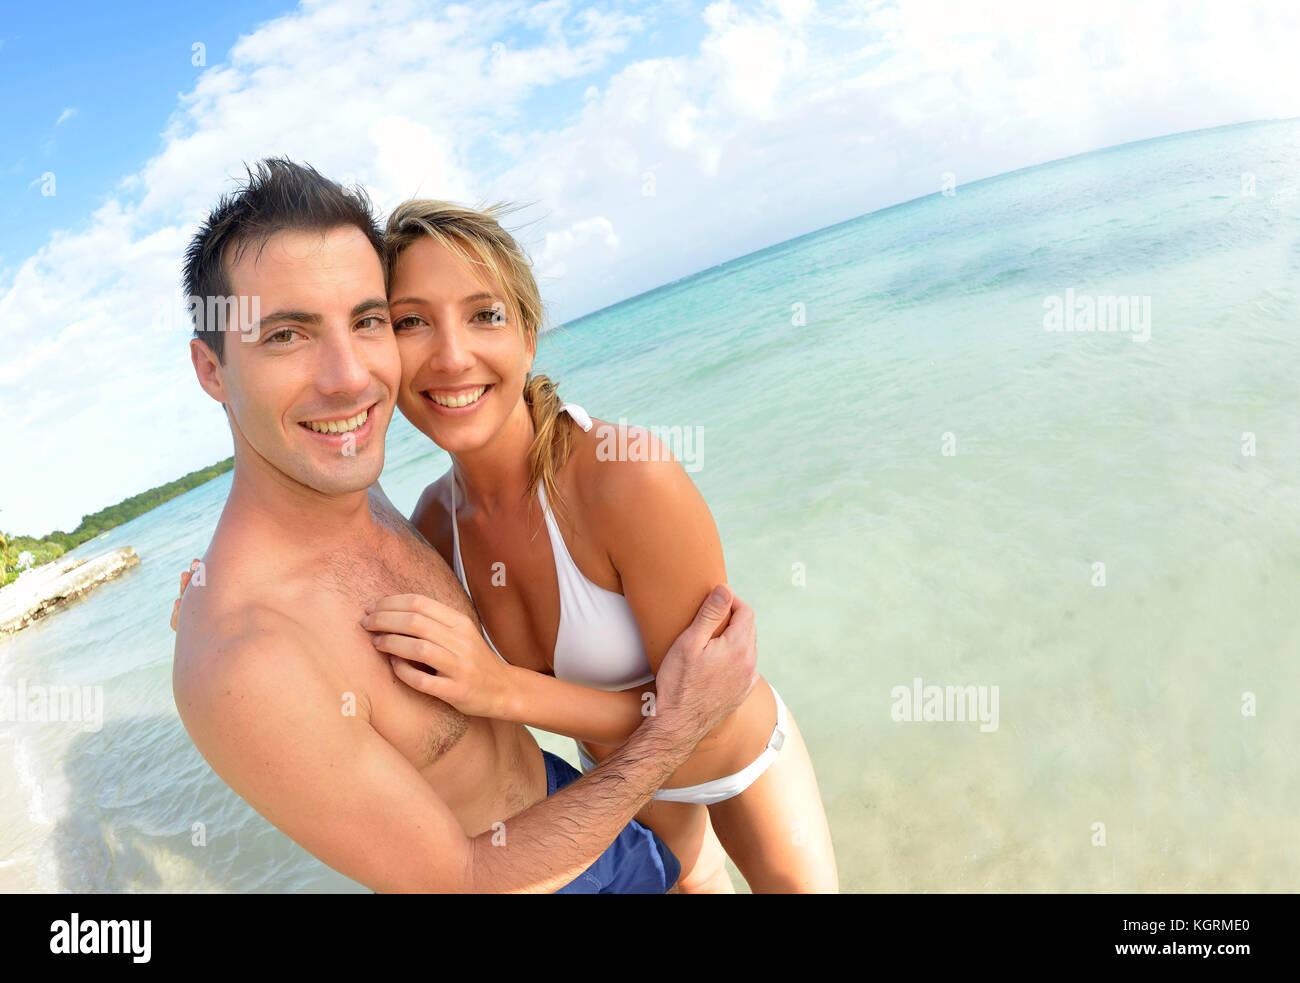 Couple having fun at the beach - Stock Image